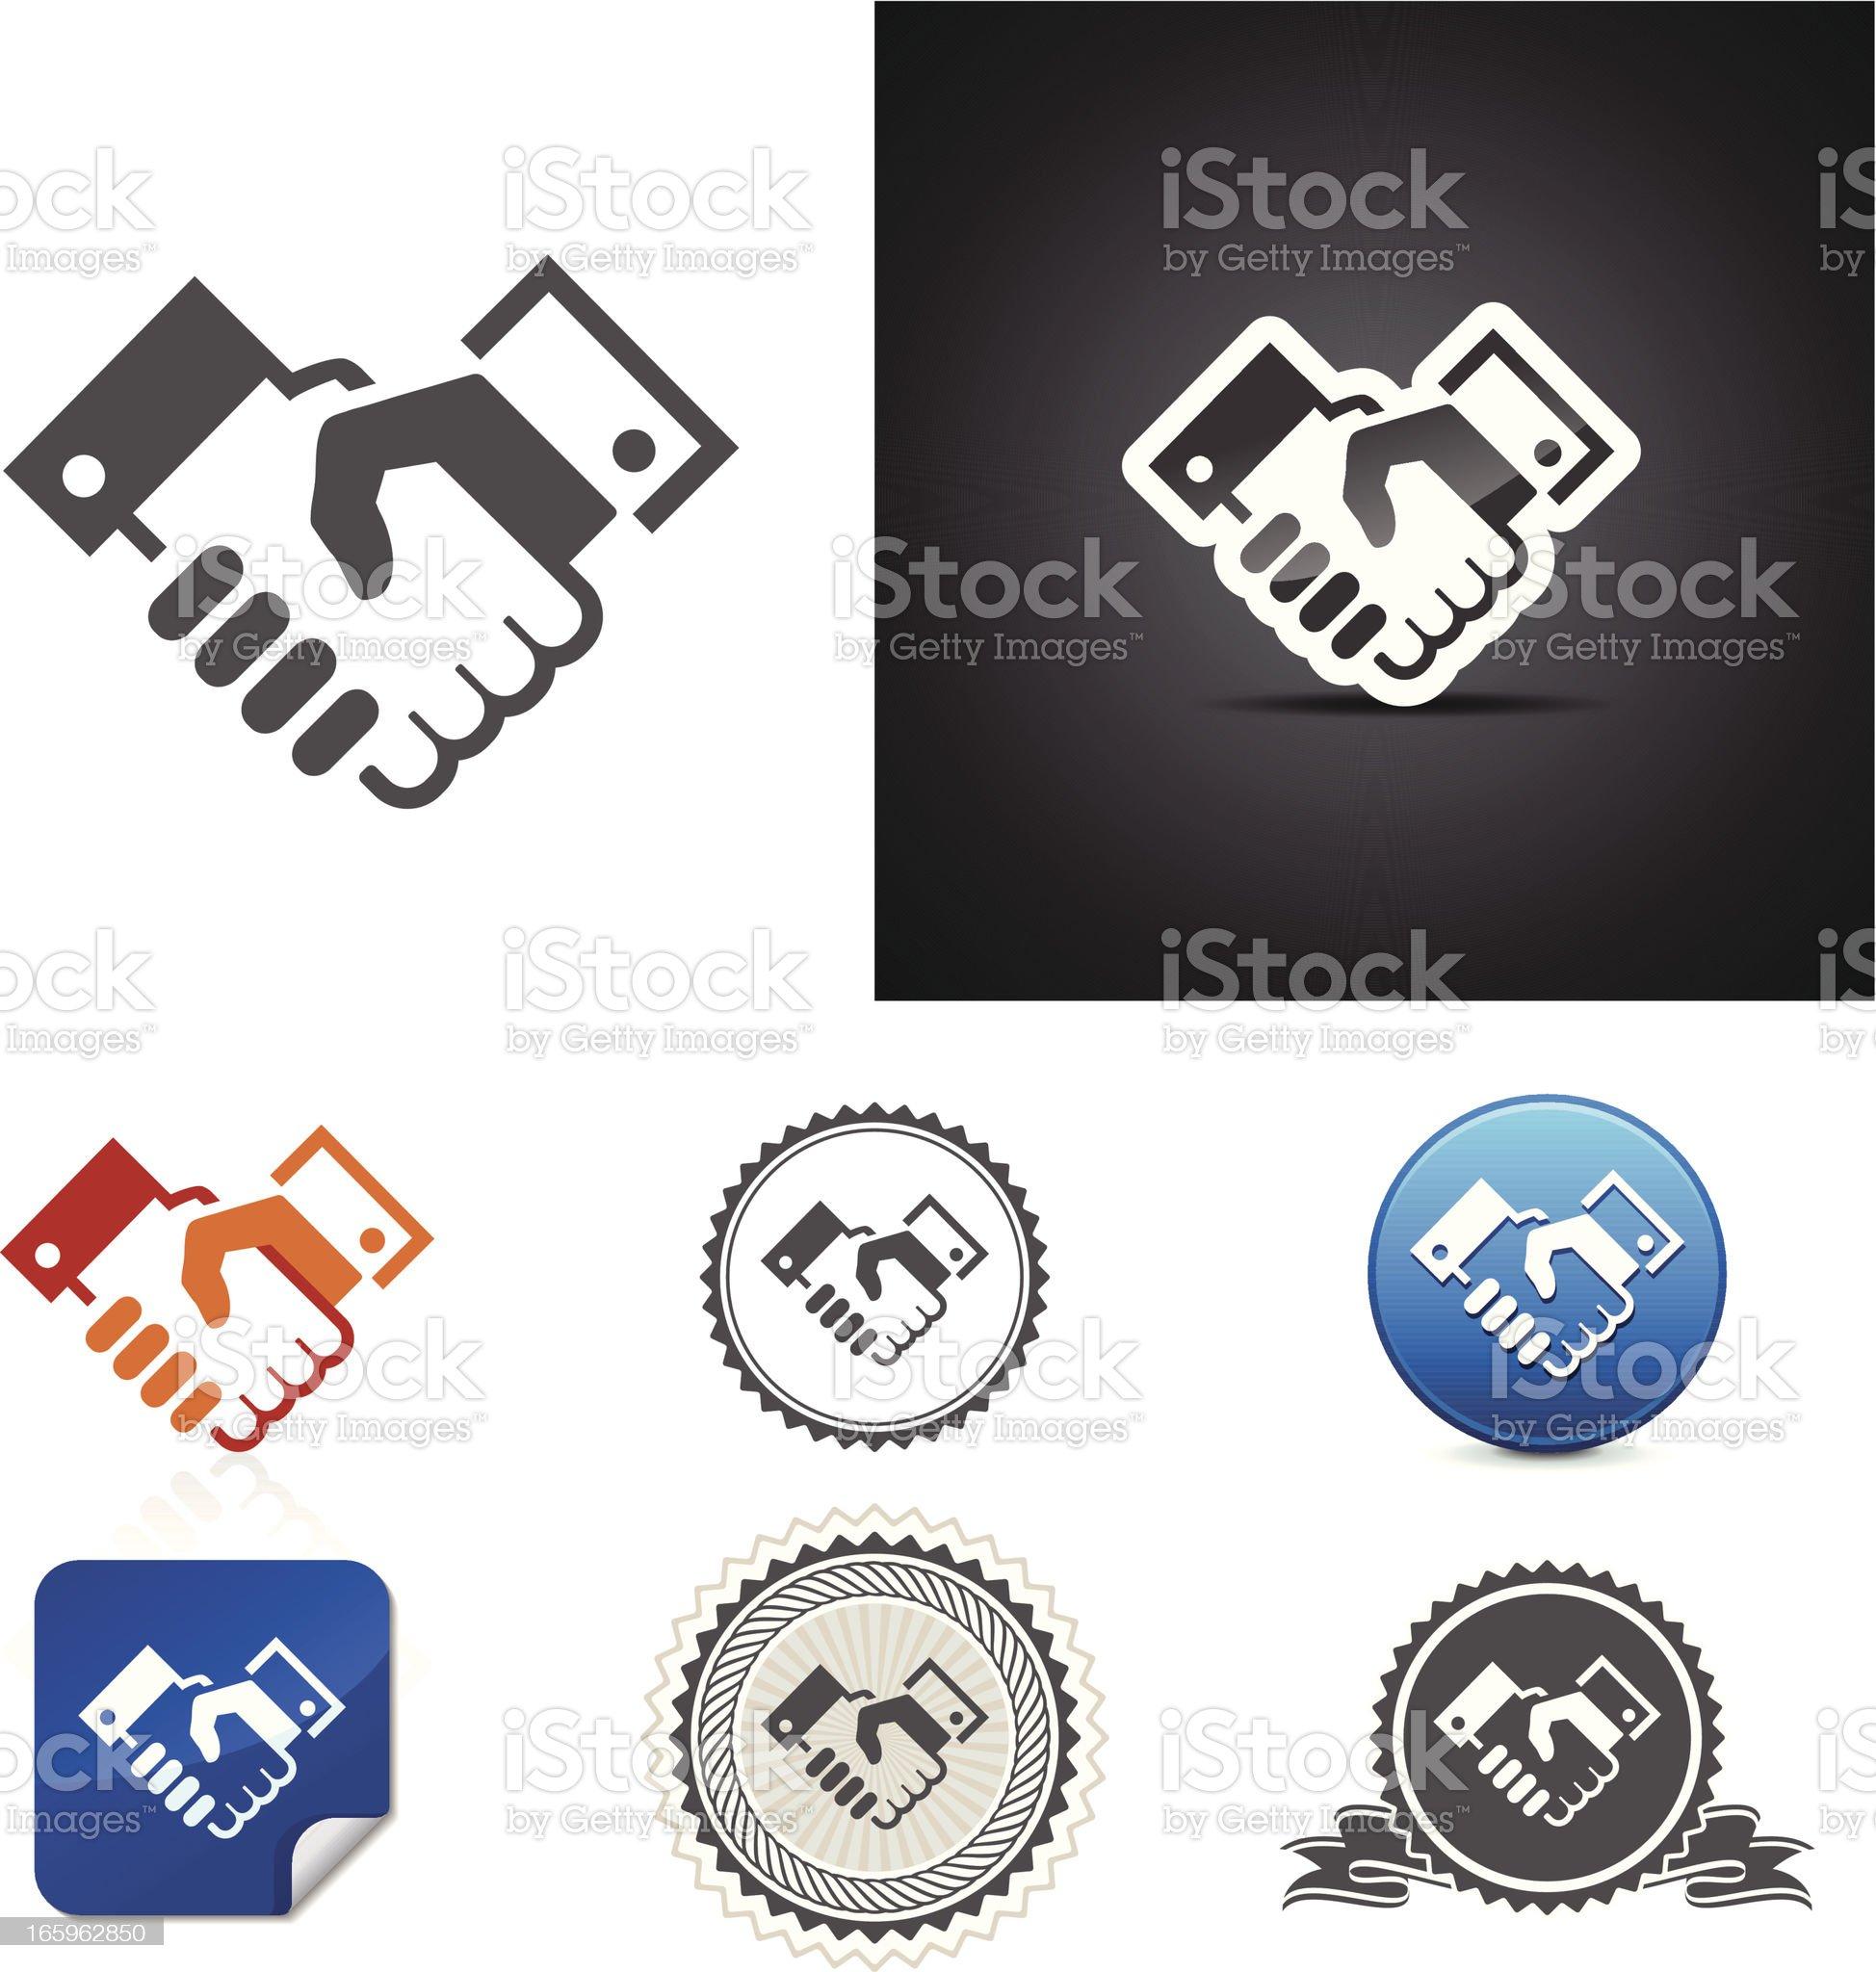 Handshake icons royalty-free stock vector art